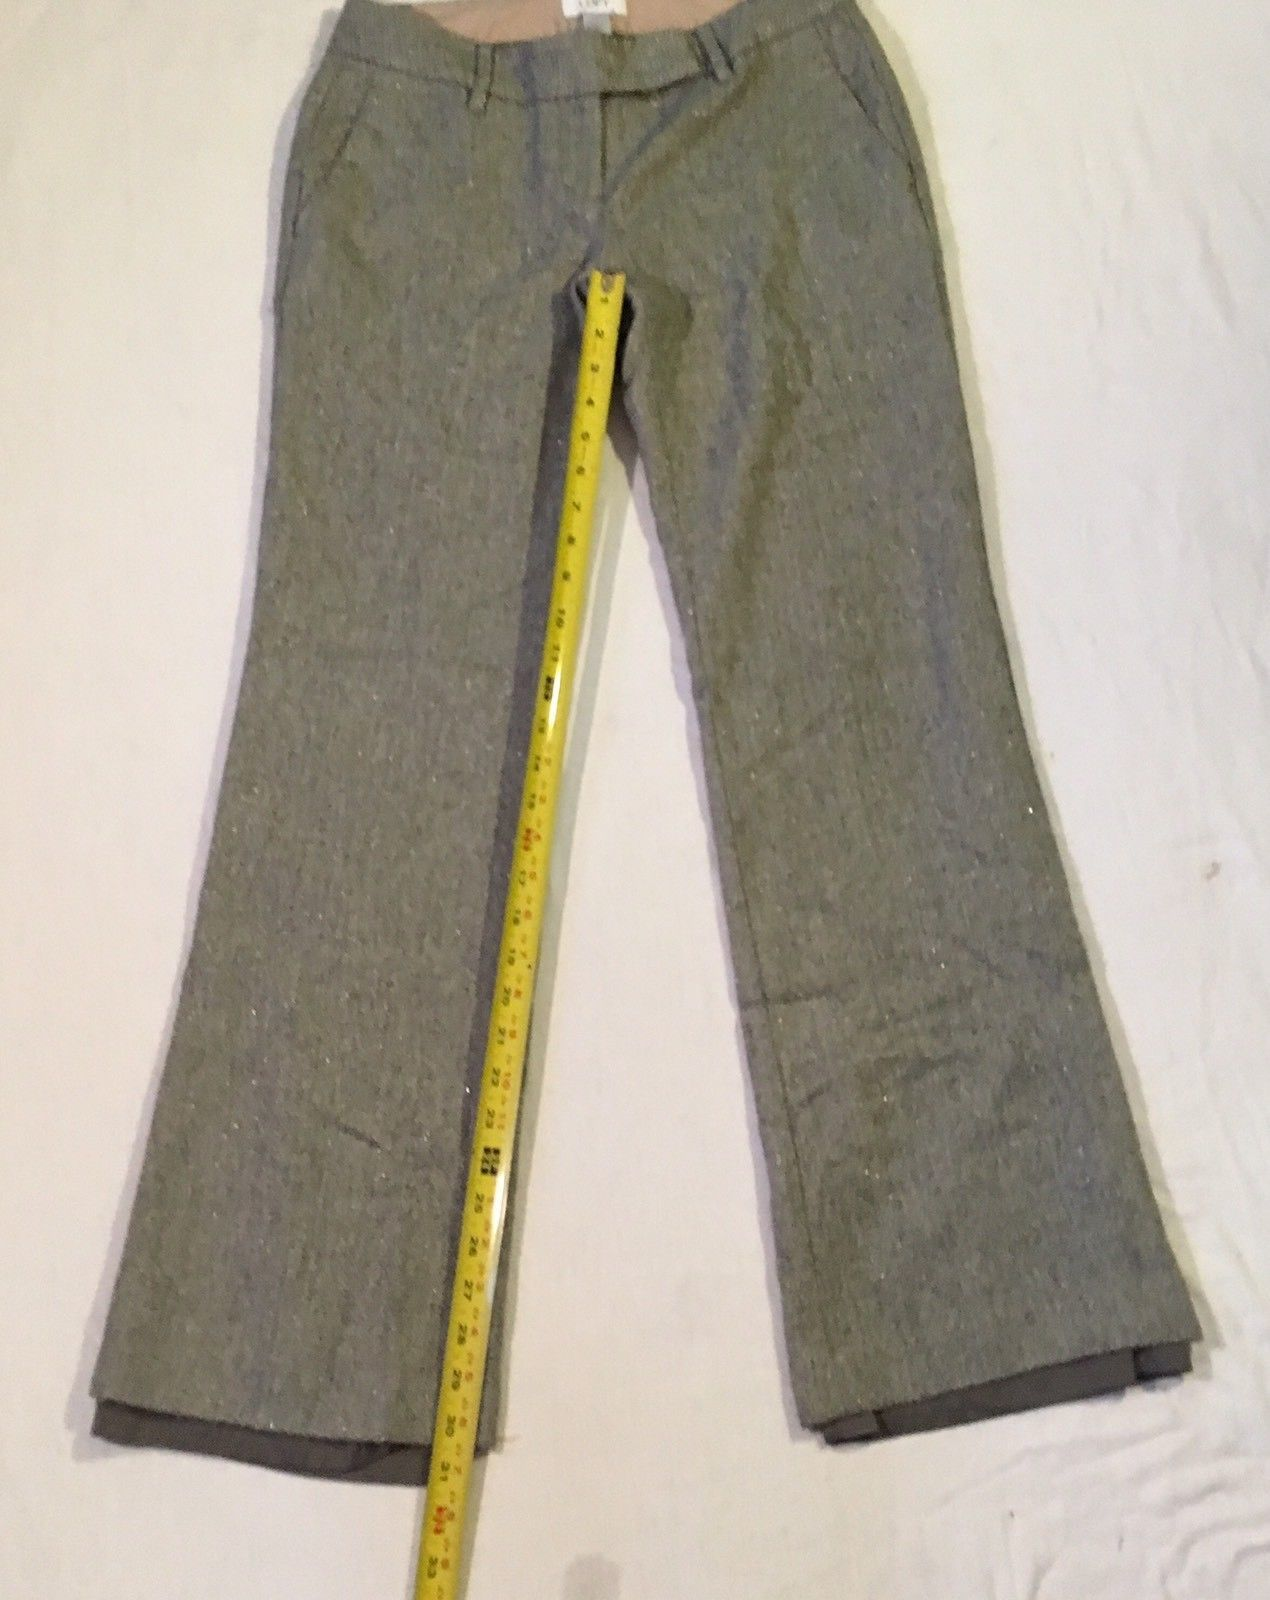 ef83a697710 Ann Taylor Loft Size 2 Pants Marisa Gray Textured Lined Flat Front Straight  Leg